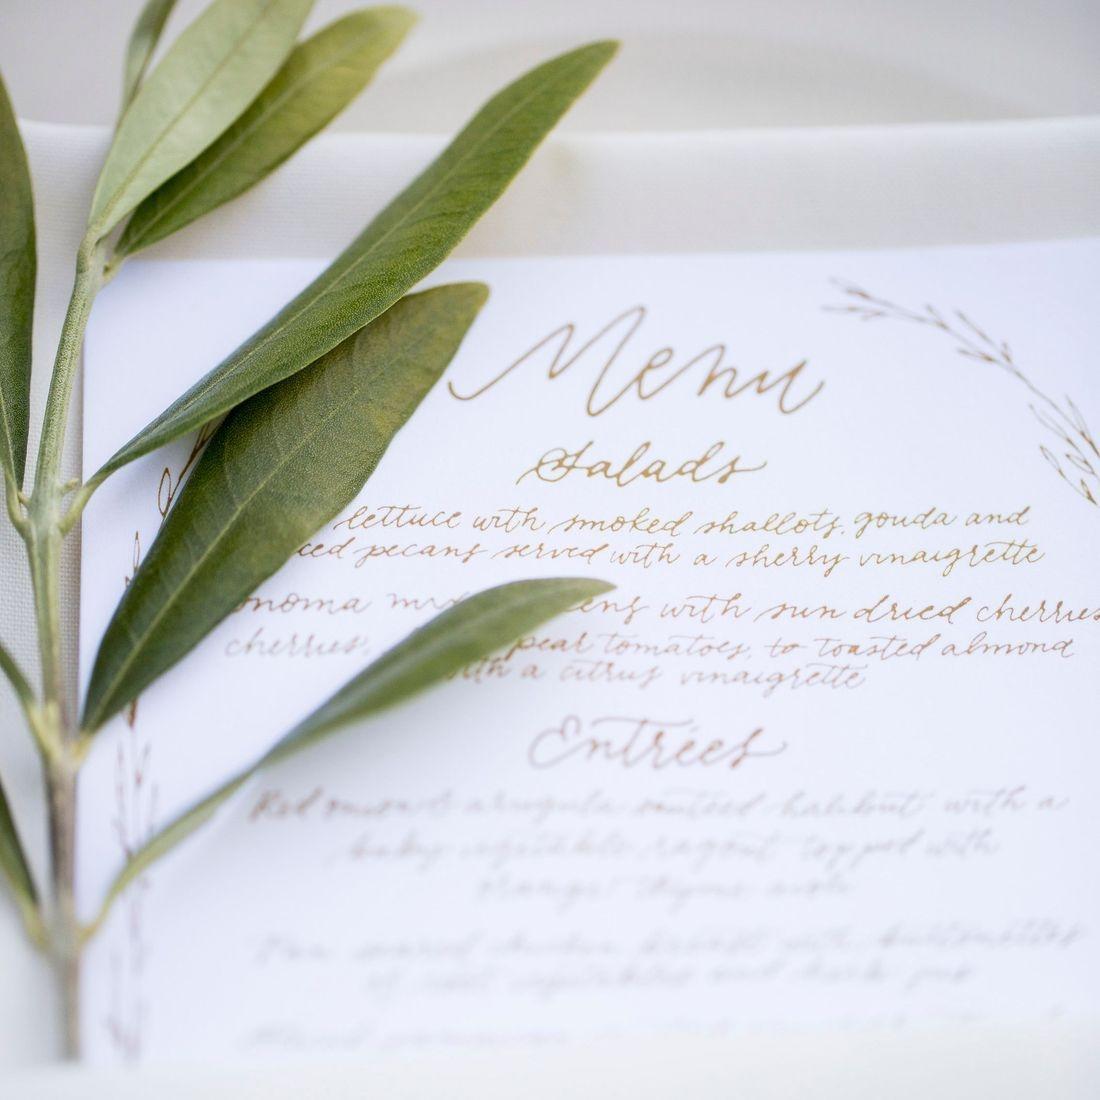 BAY AREA WEDDING PLANNER